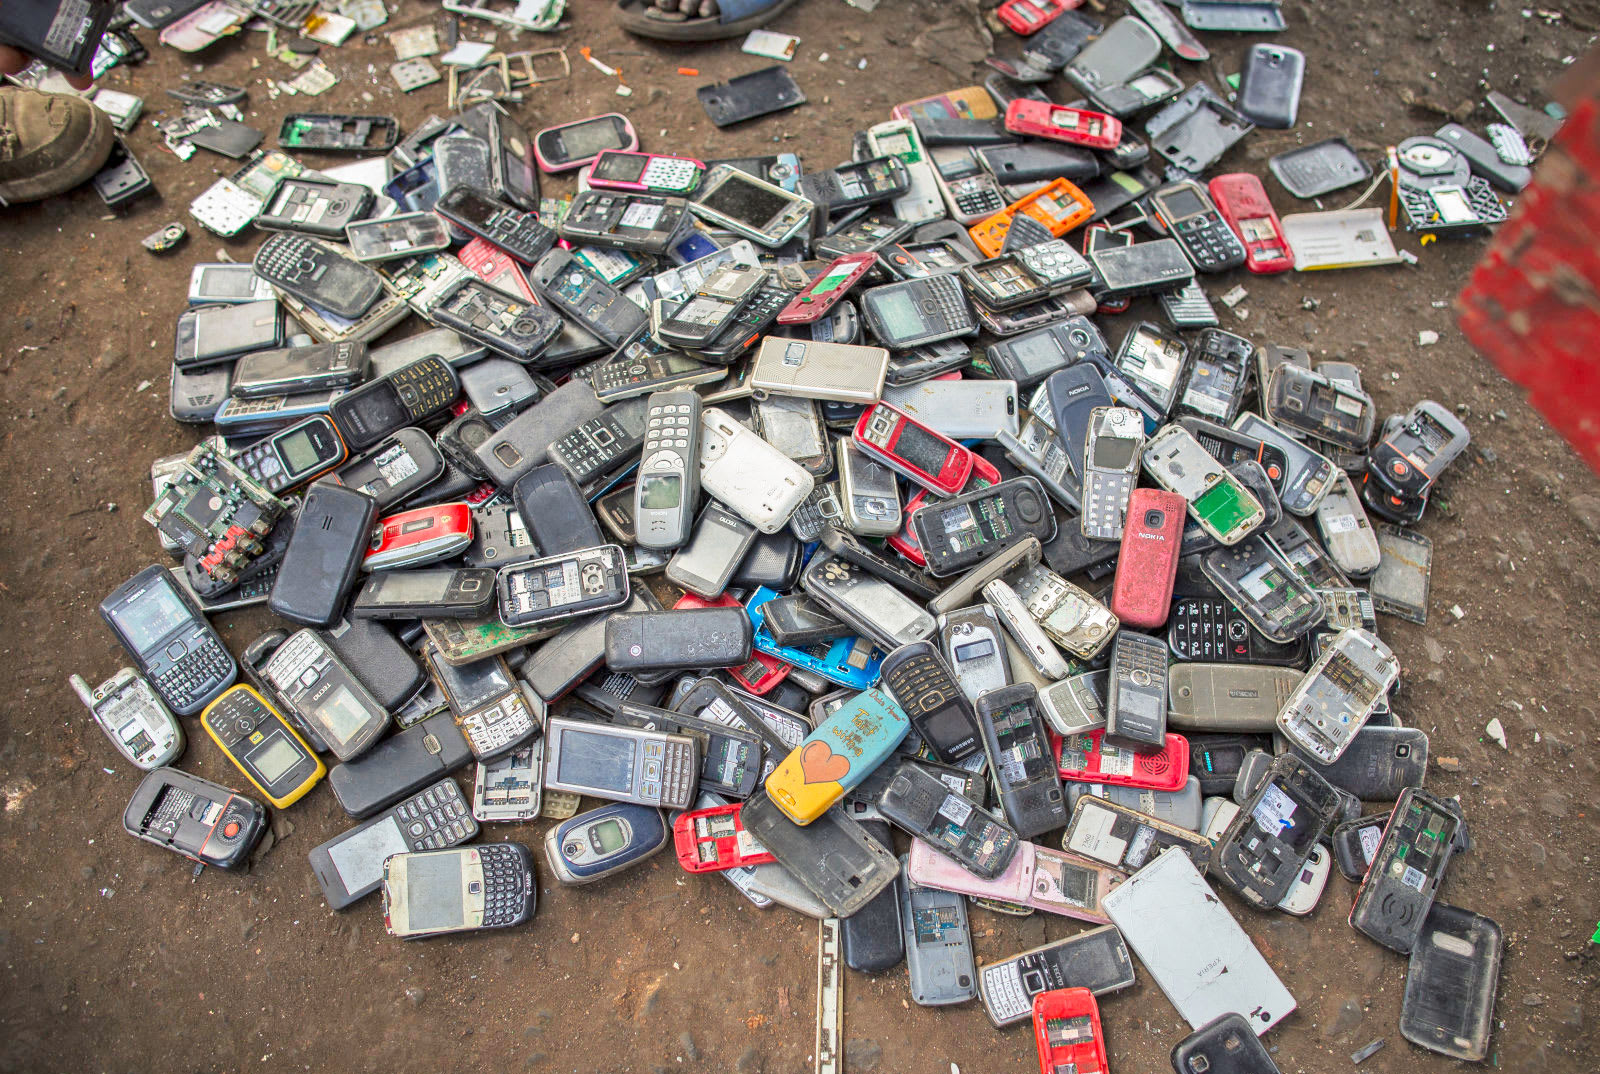 Greenpeace and iFixit slam smartphone companies over e-waste